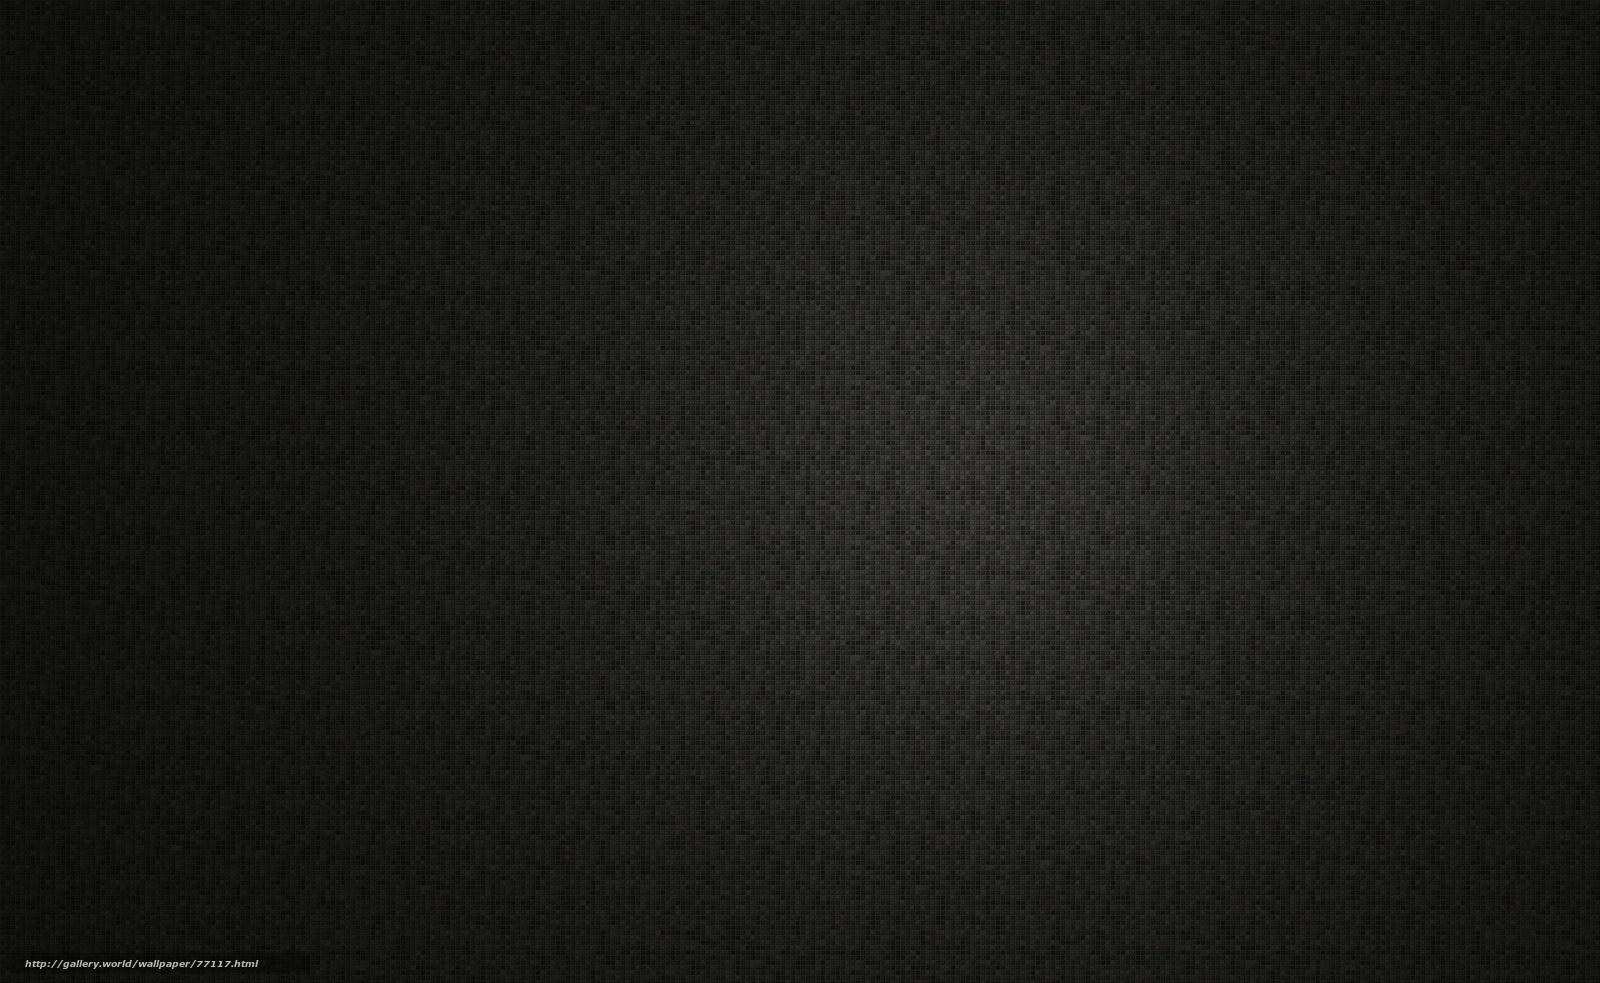 Tlcharger fond d 39 ecran sombre net cubes fonds d 39 ecran for Fond ecran sombre